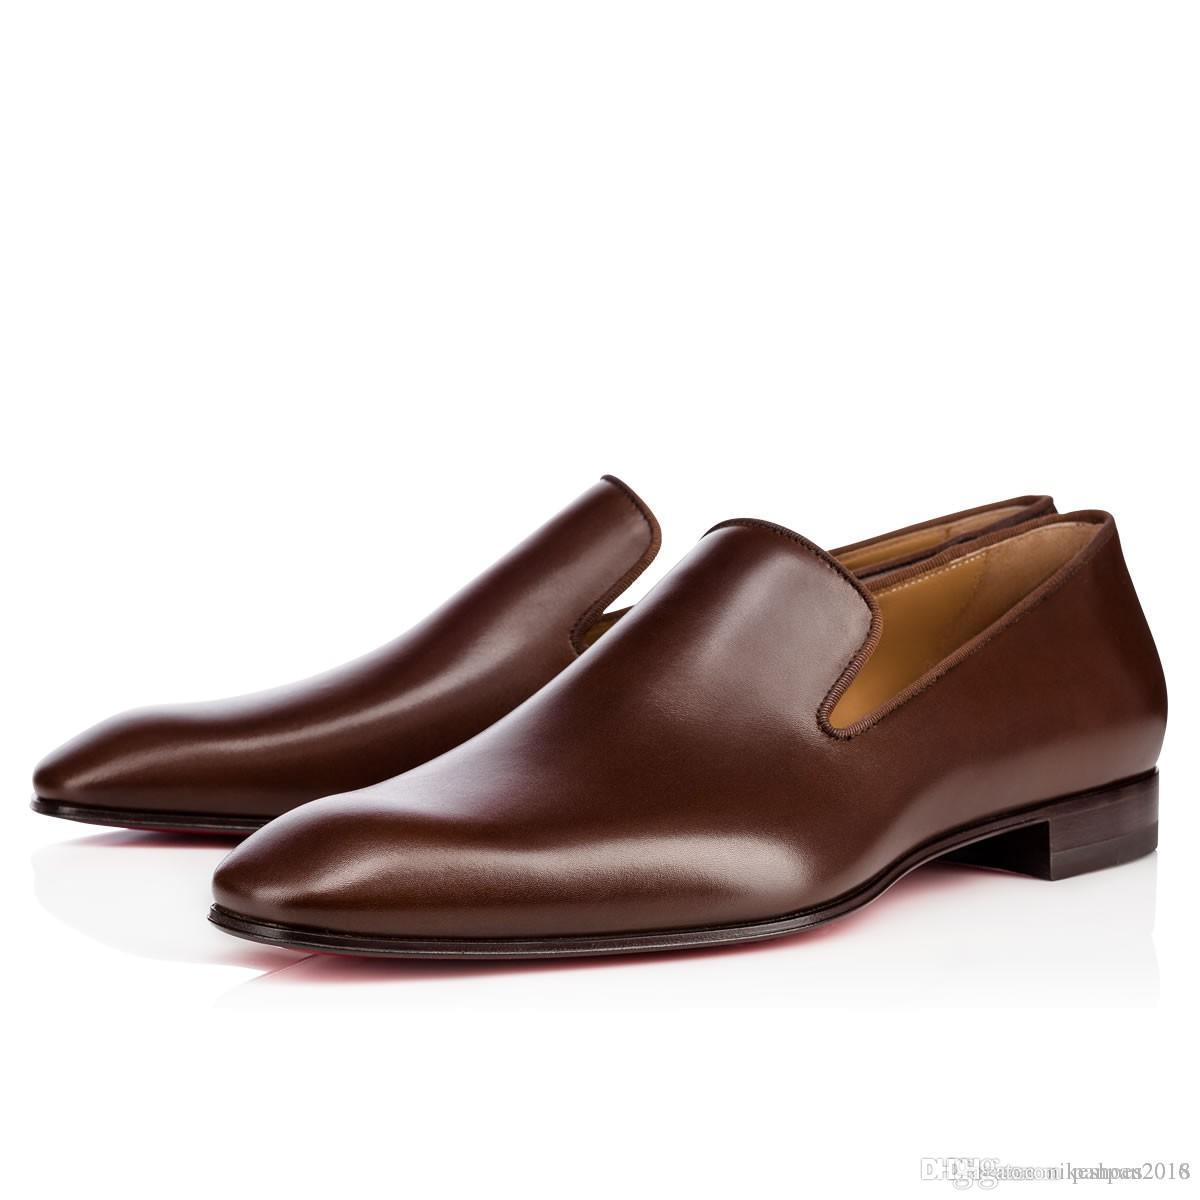 Red Sole Oxford Men Businesss Dress Red Bottom Shoe Dandelion Flat Sophistication Man Dress Shoes Calf Leather Gentleman Wedding